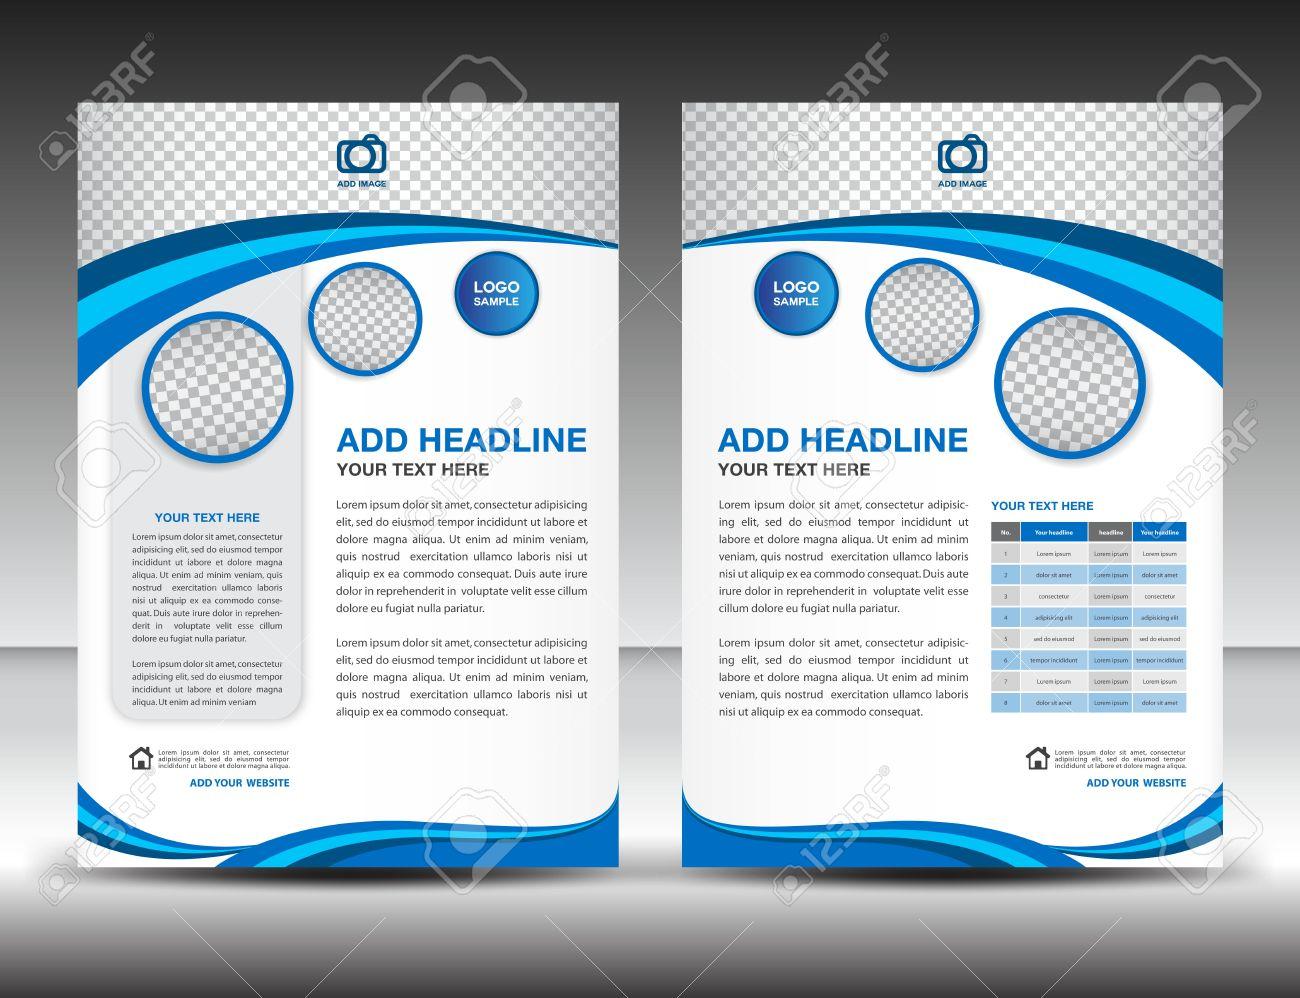 Design layout template in a4 size poster leafletnewsletter design layout template in a4 size poster leafletnewslettercatalog cover spiritdancerdesigns Images